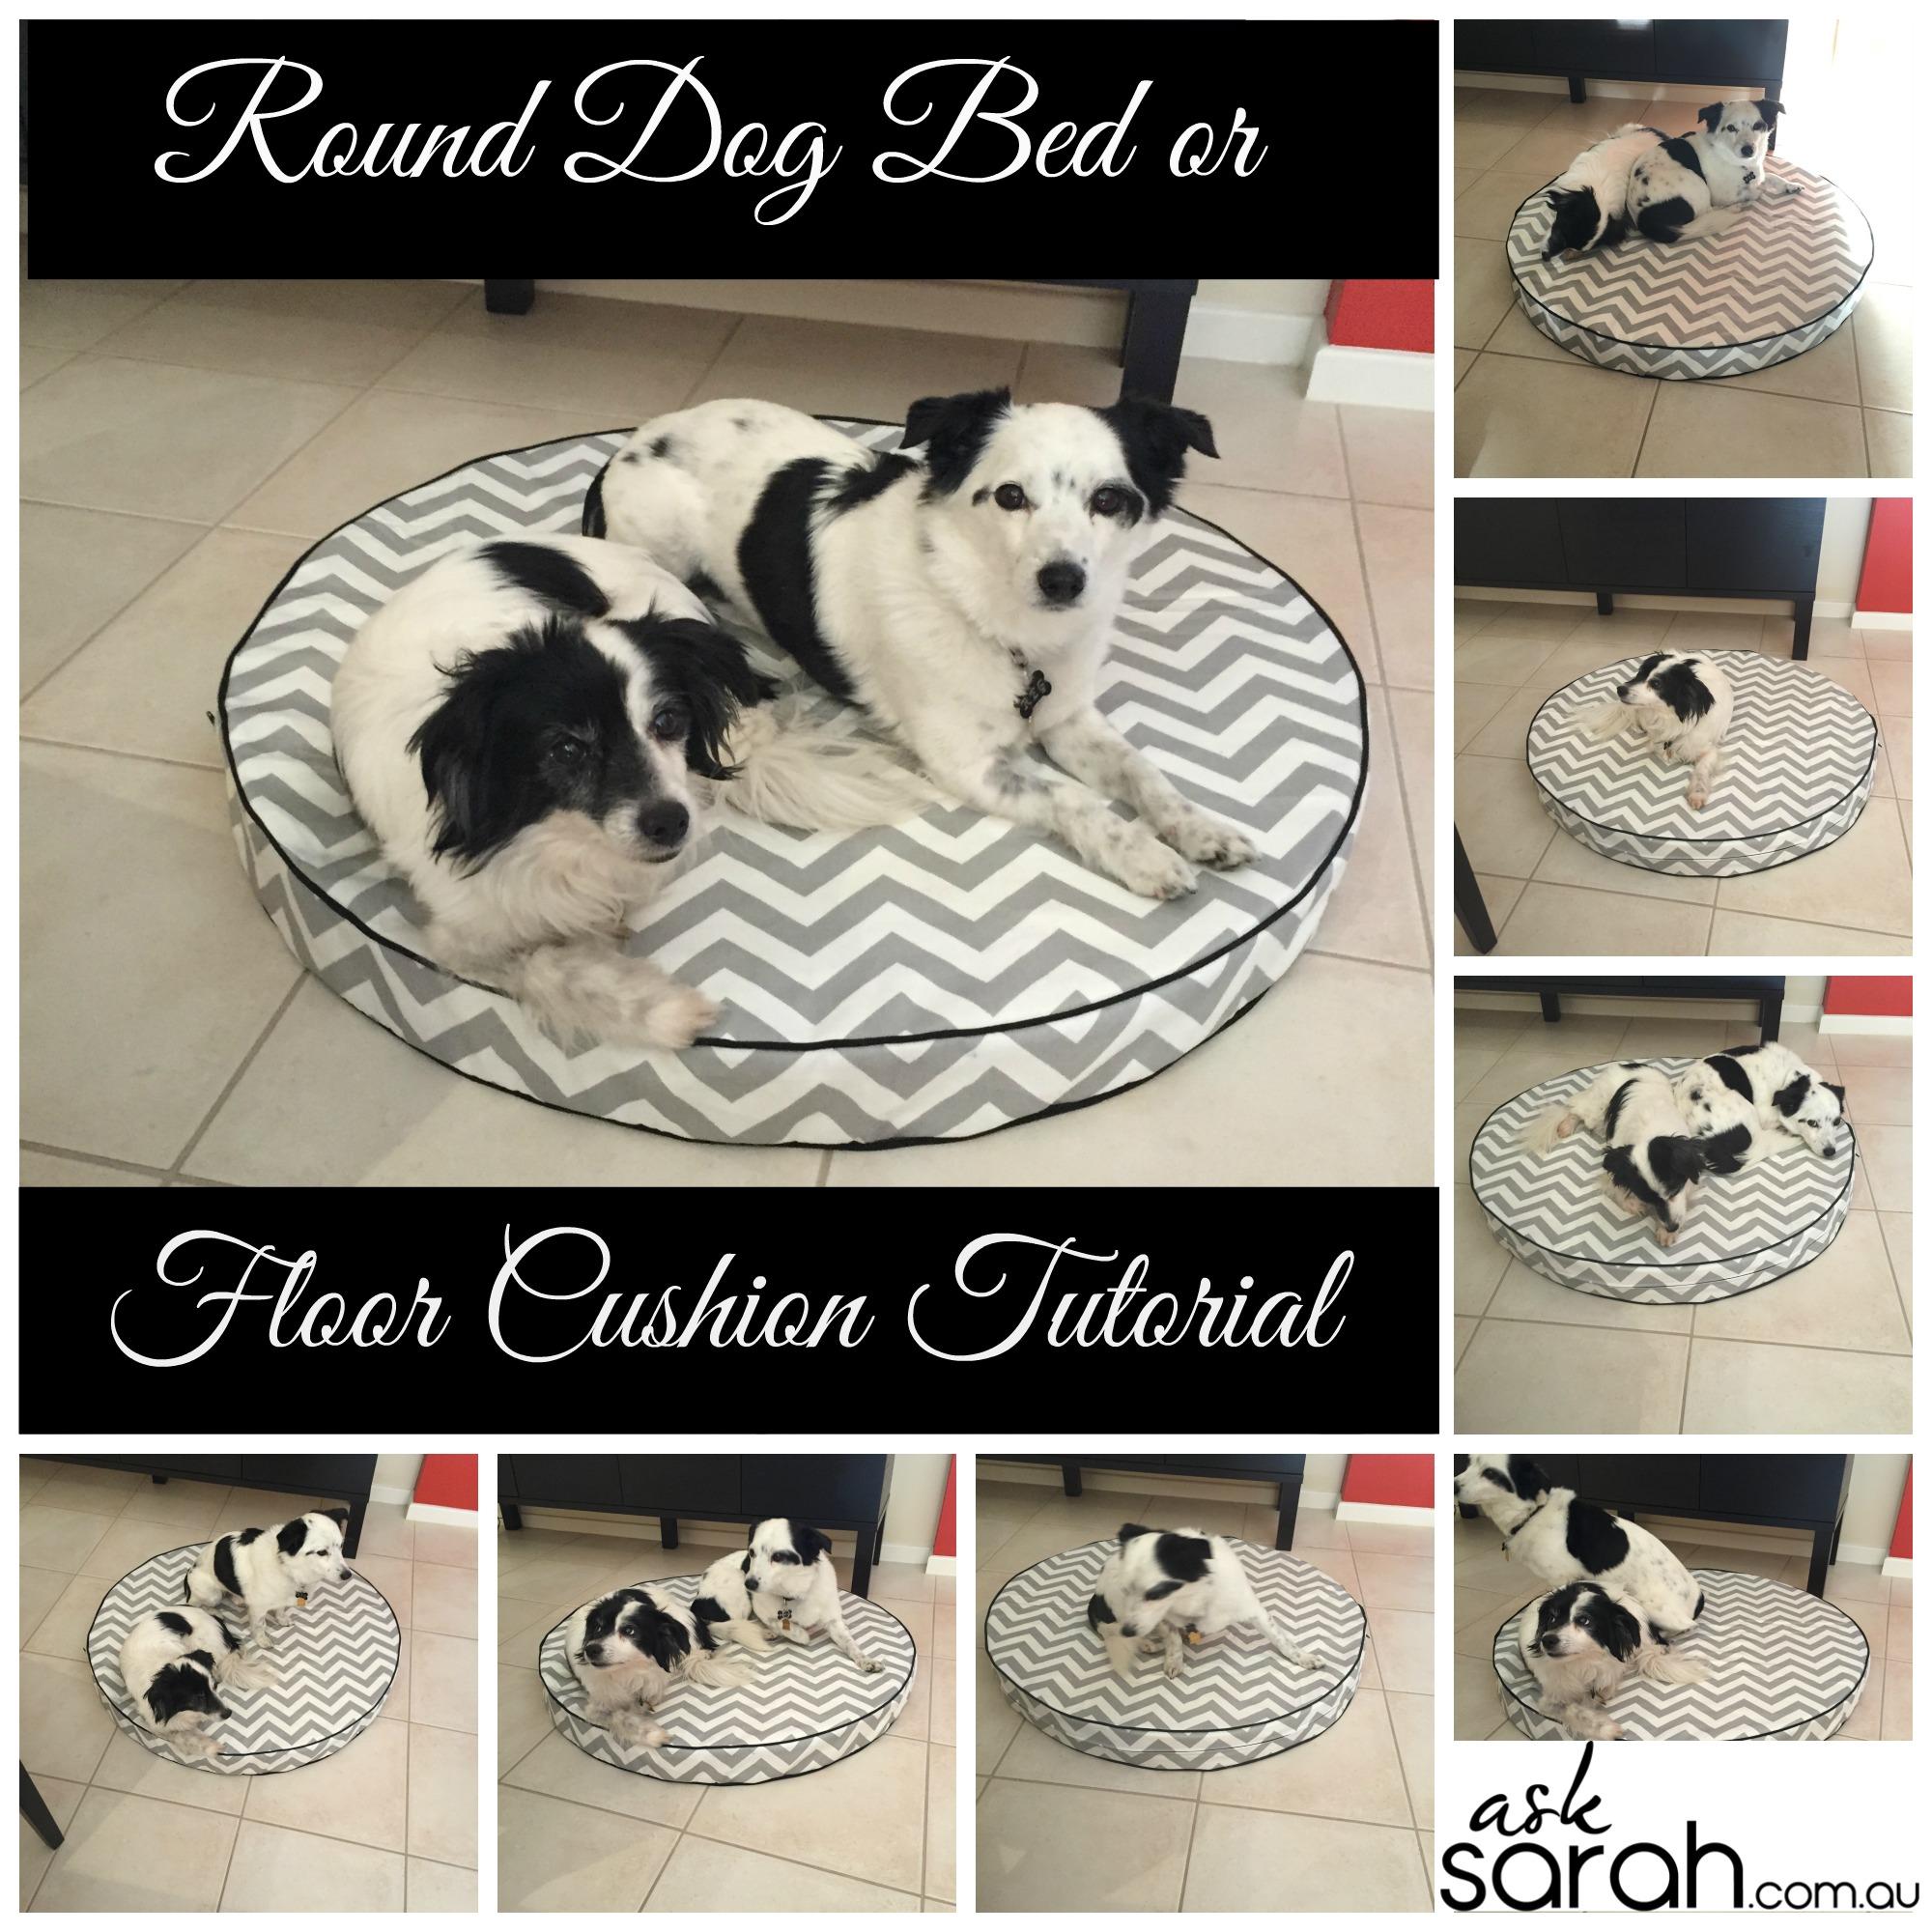 deluxe bed resolutions x mattress comfort w dog com bedrooms beds foam hd buddyrest all memory ultra h